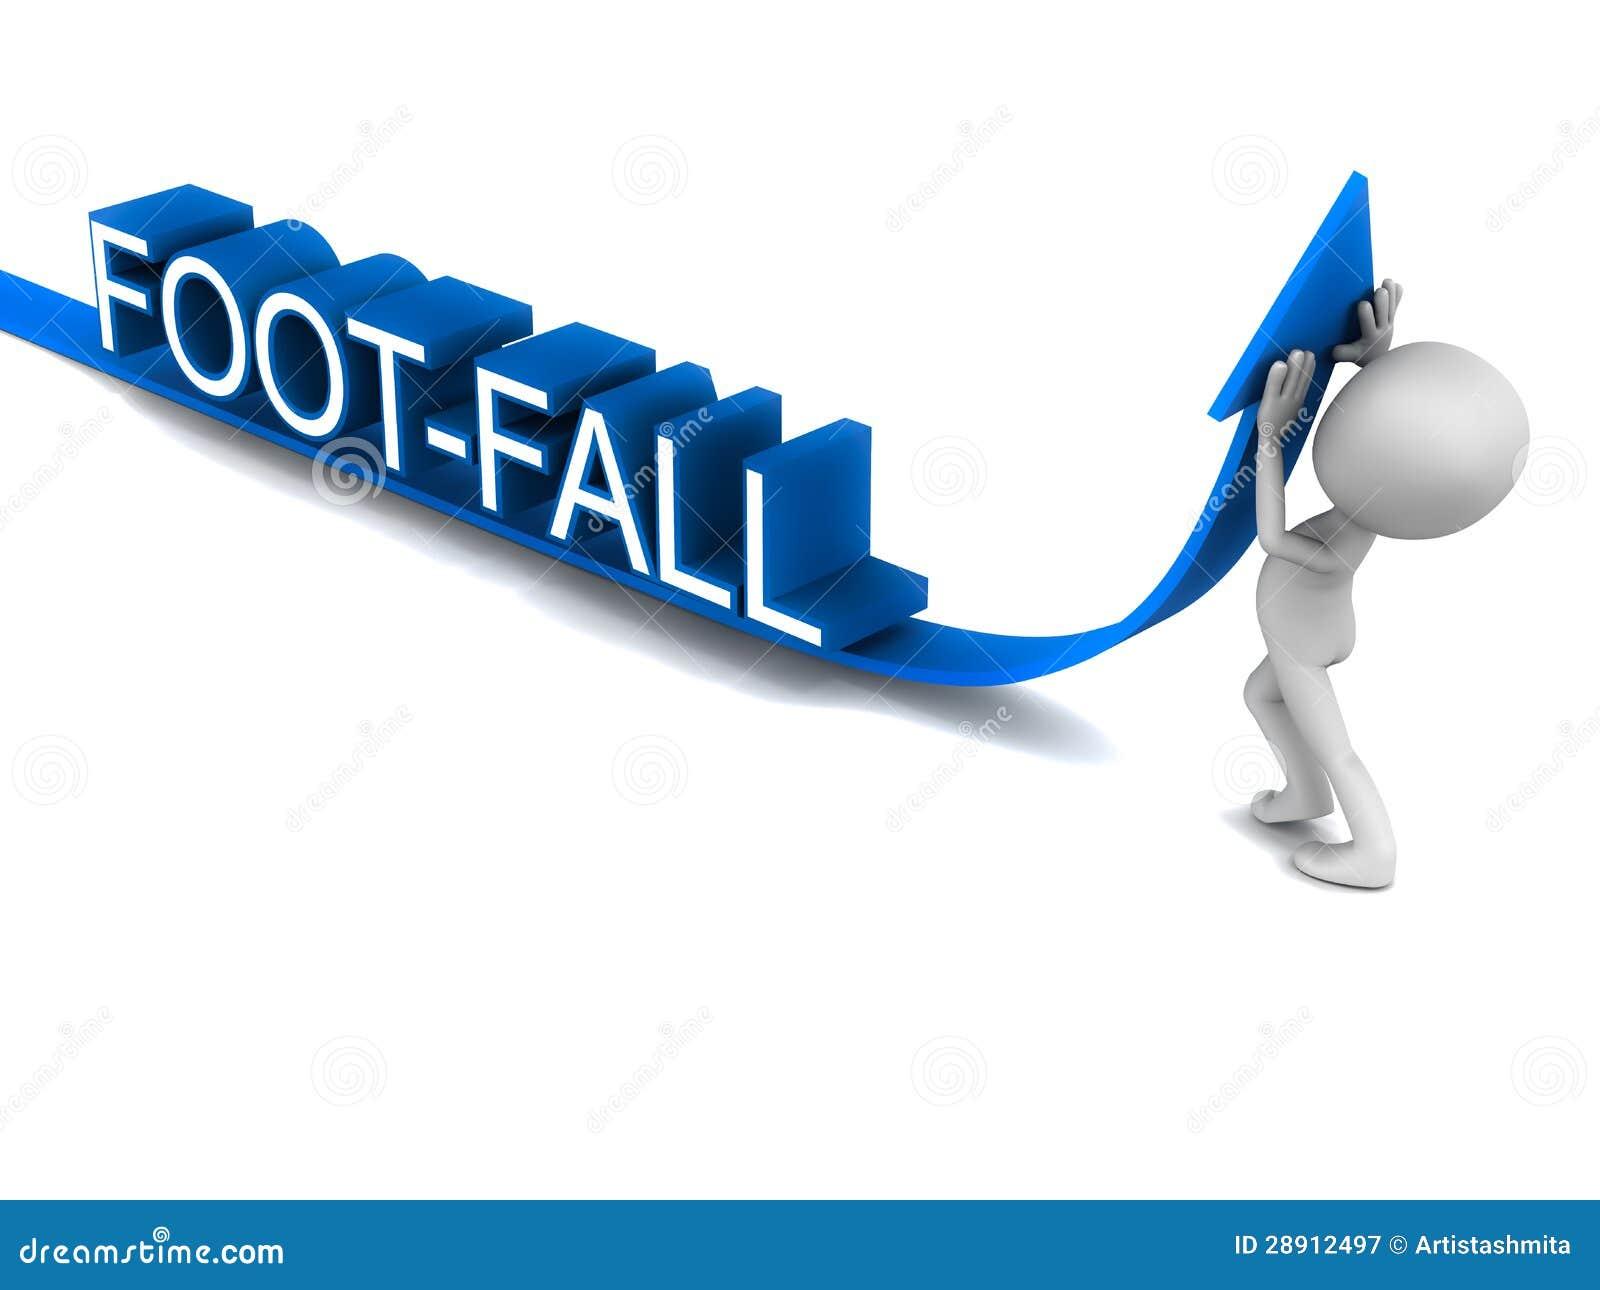 Increase Footfall Royalty Free Stock Photography Image